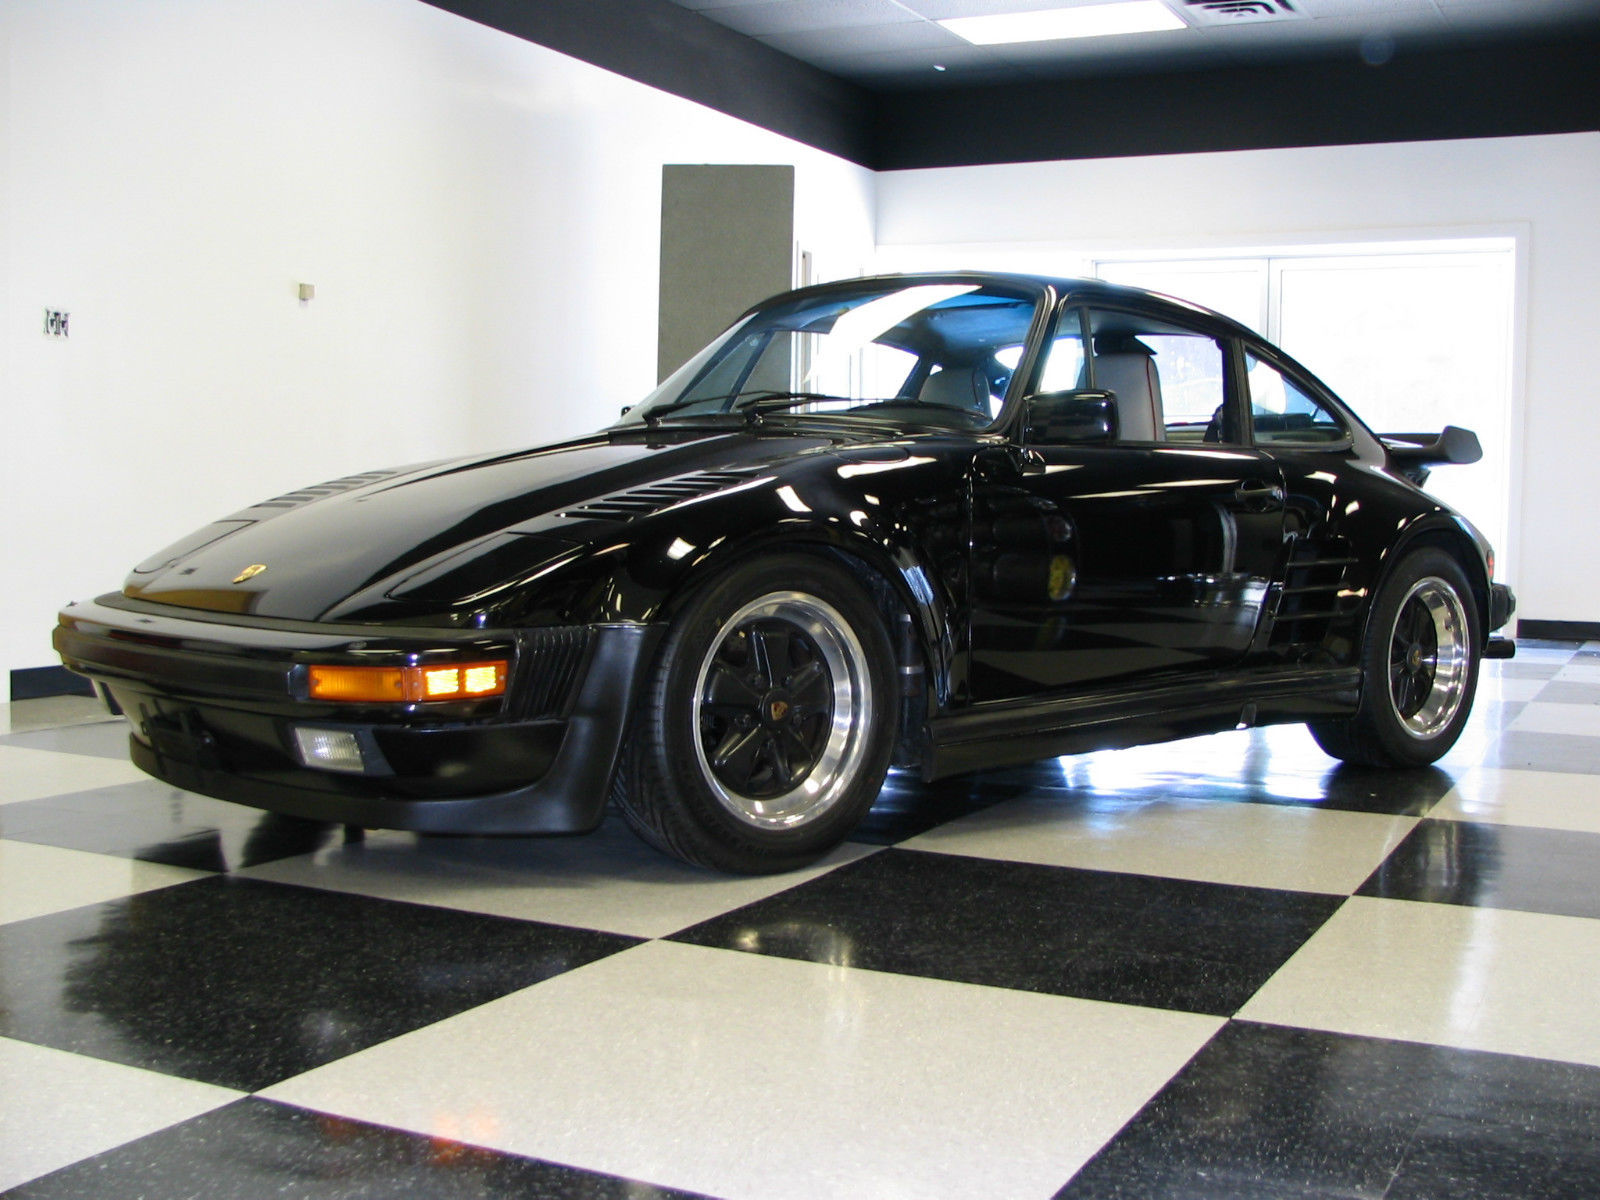 1987 Porsche 911 930 Turbo Slantnose For Sale